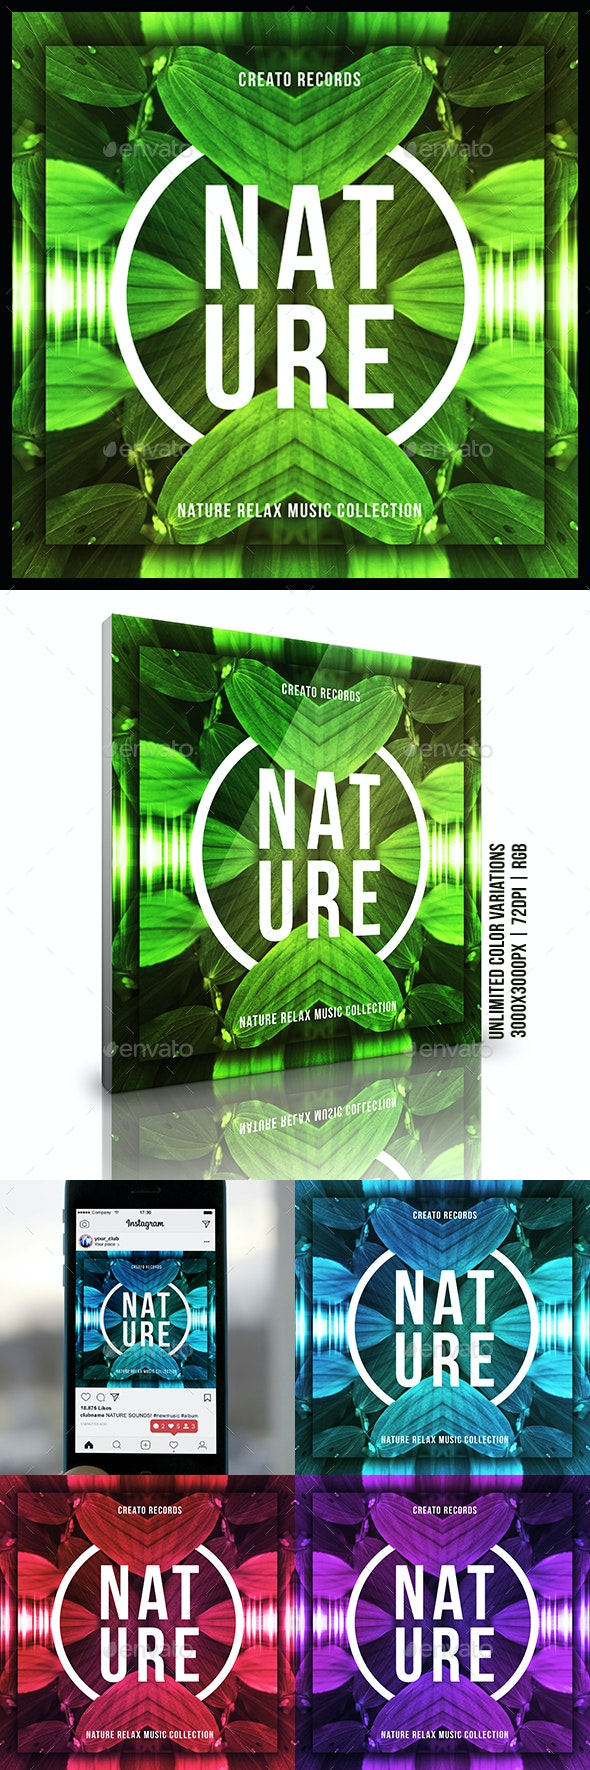 Nature Music Album Cover Artwork Template - Miscellaneous Social Media